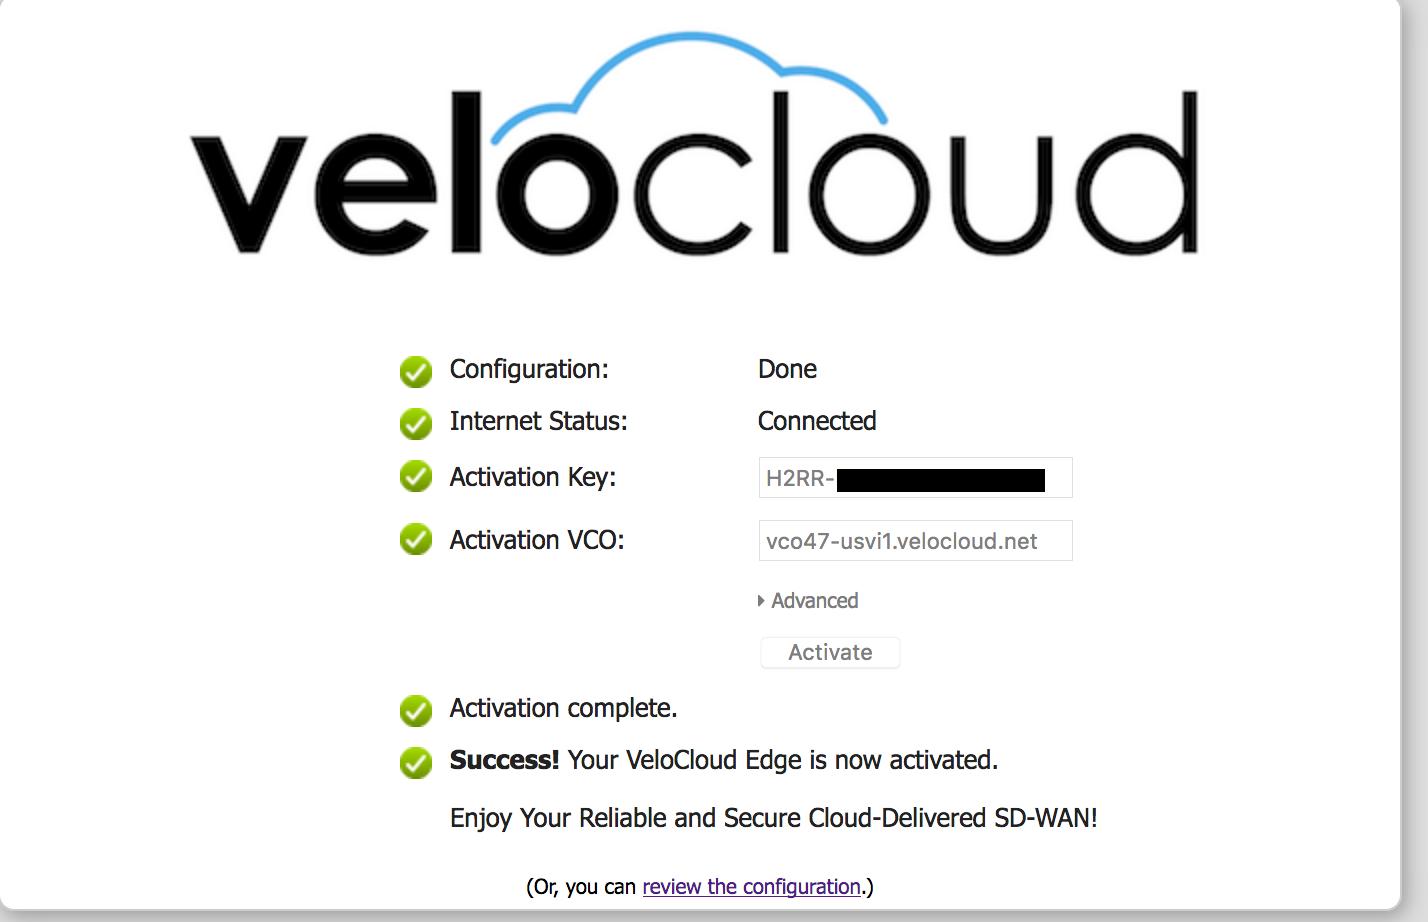 Unboxing of VeloCloud Edge 510 | Cloud-simple net